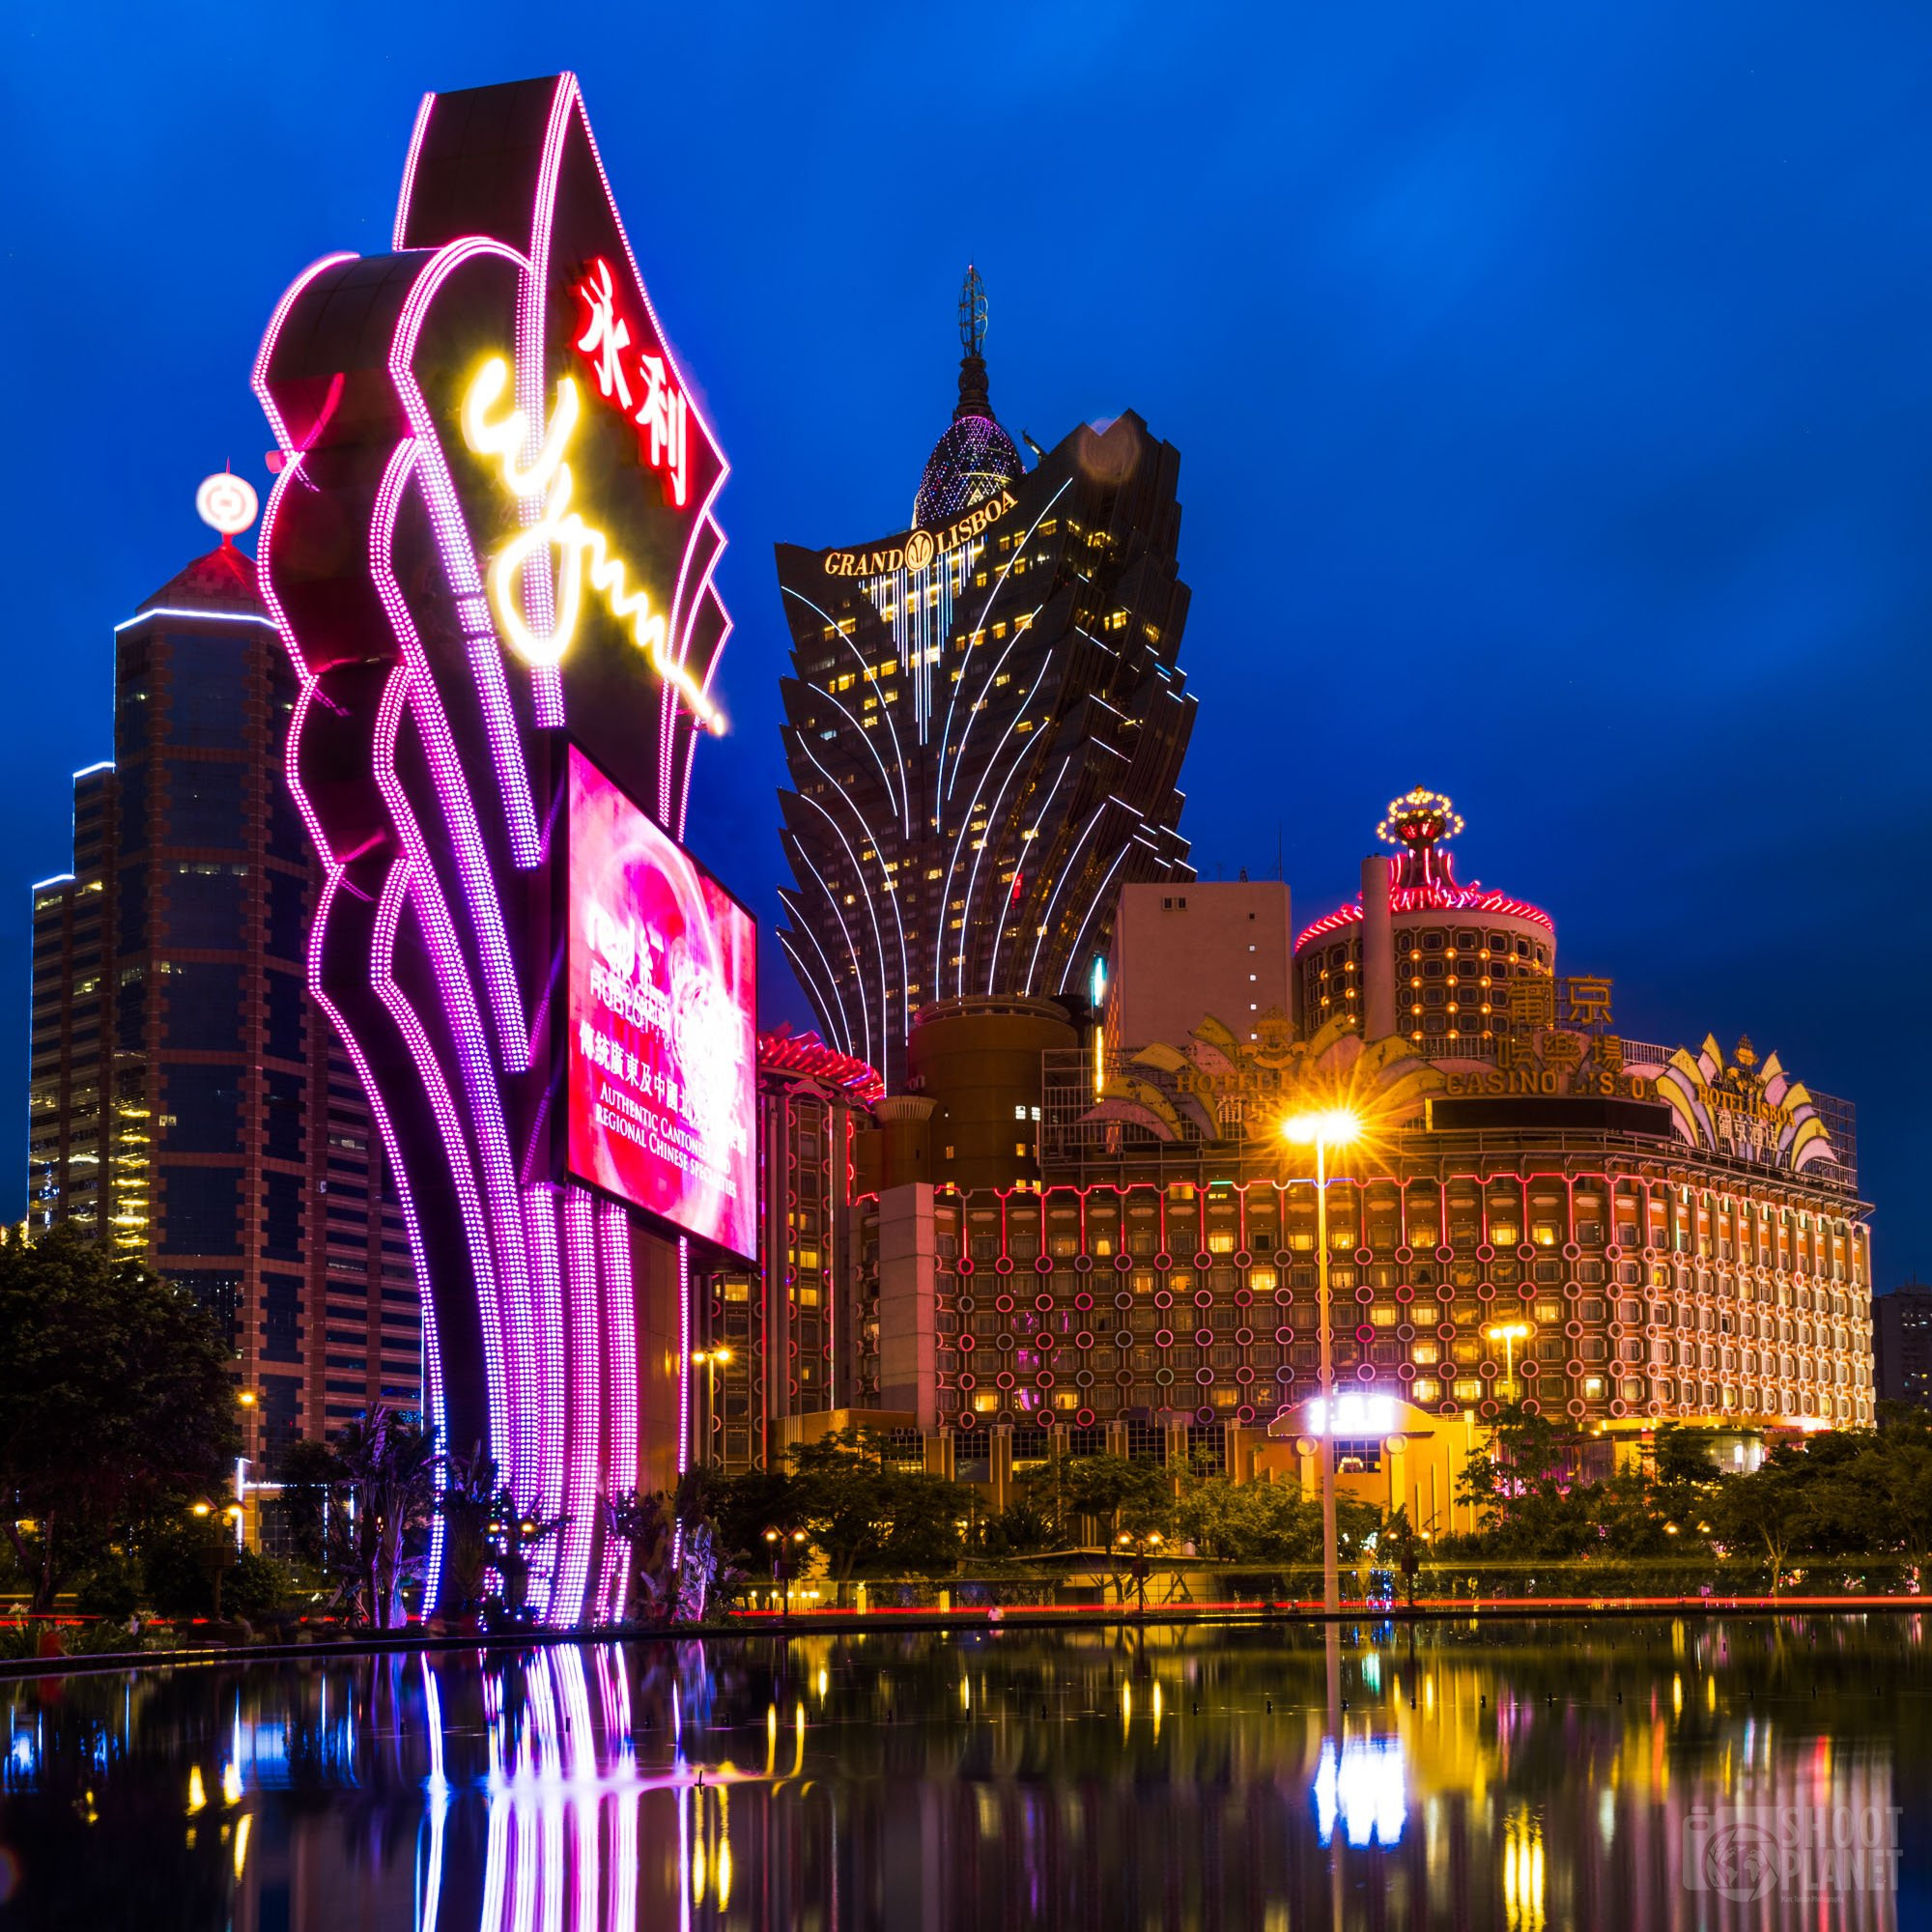 Grand Lisboa and Wynn casinos twilight, Macao